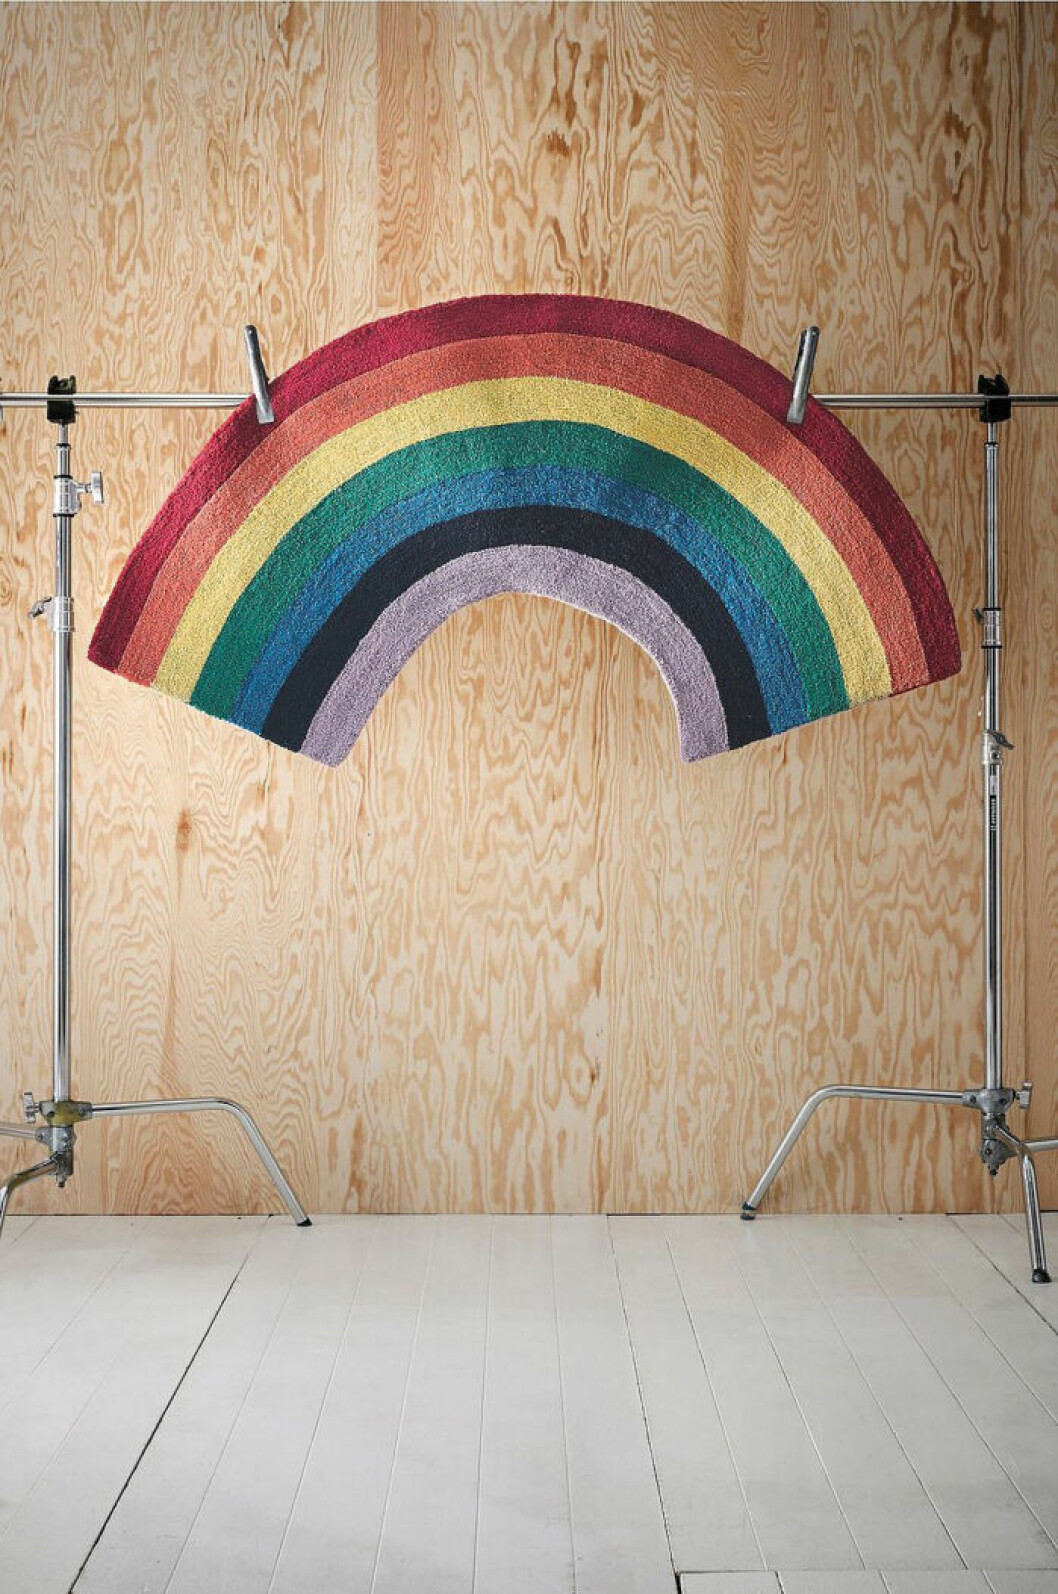 matta med regnbåge